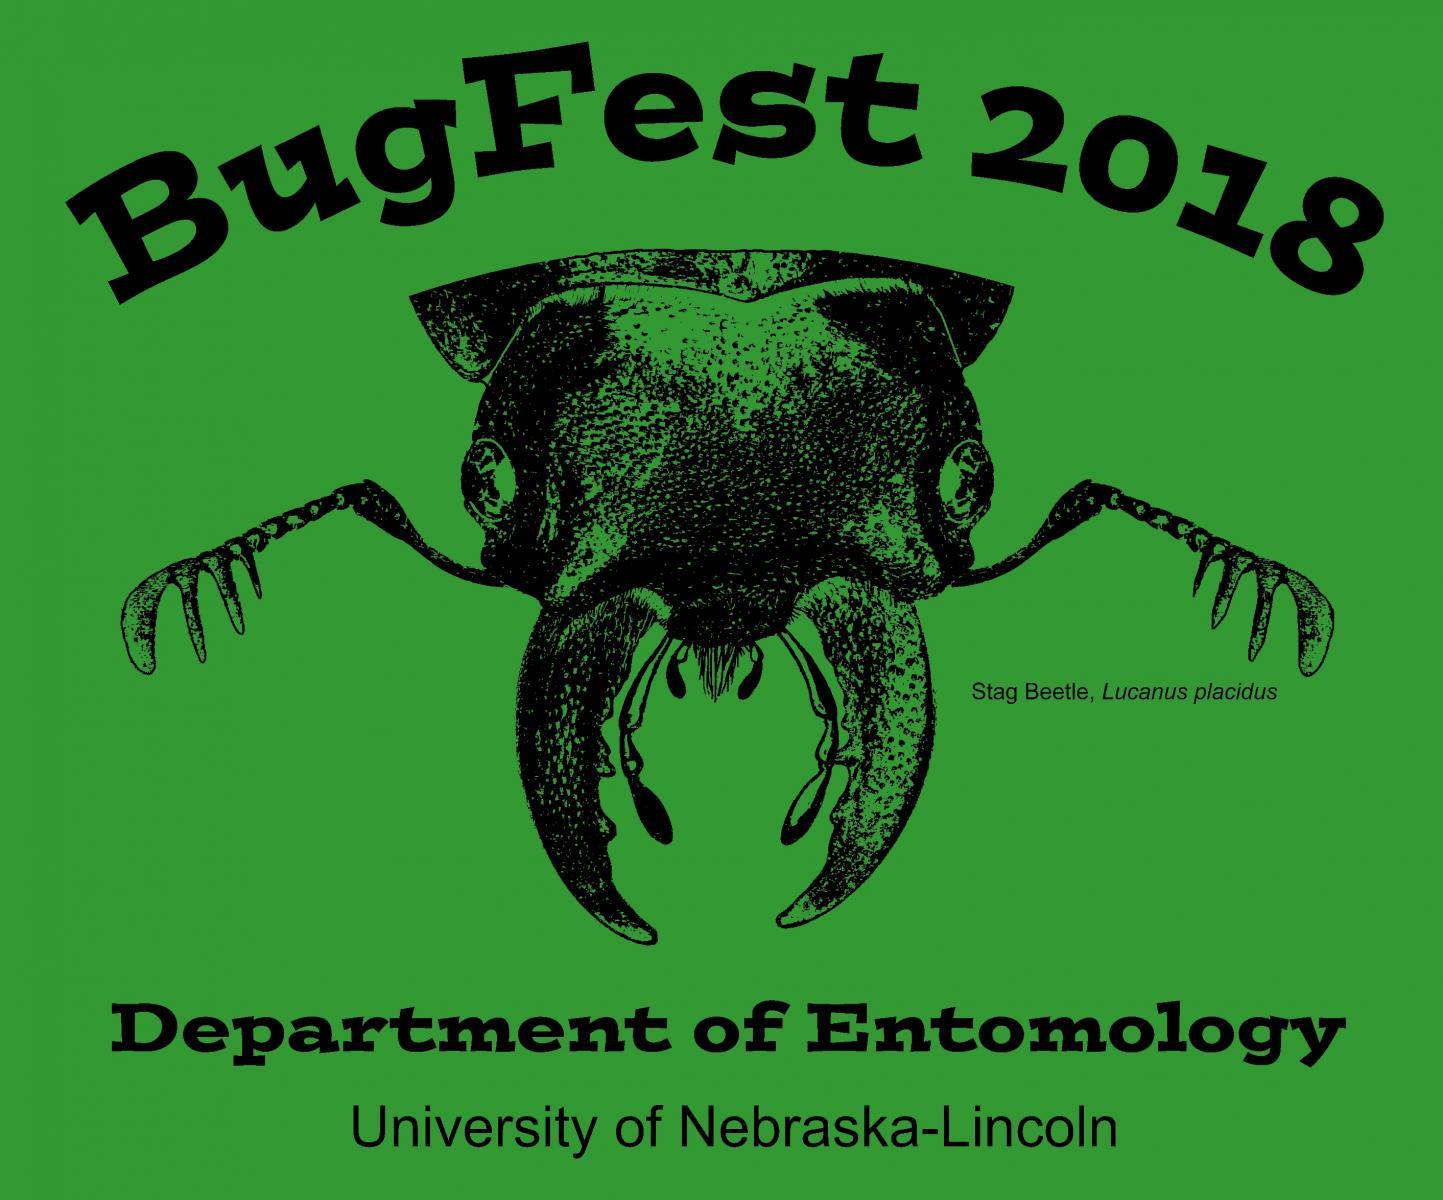 bugfest2018.jpg